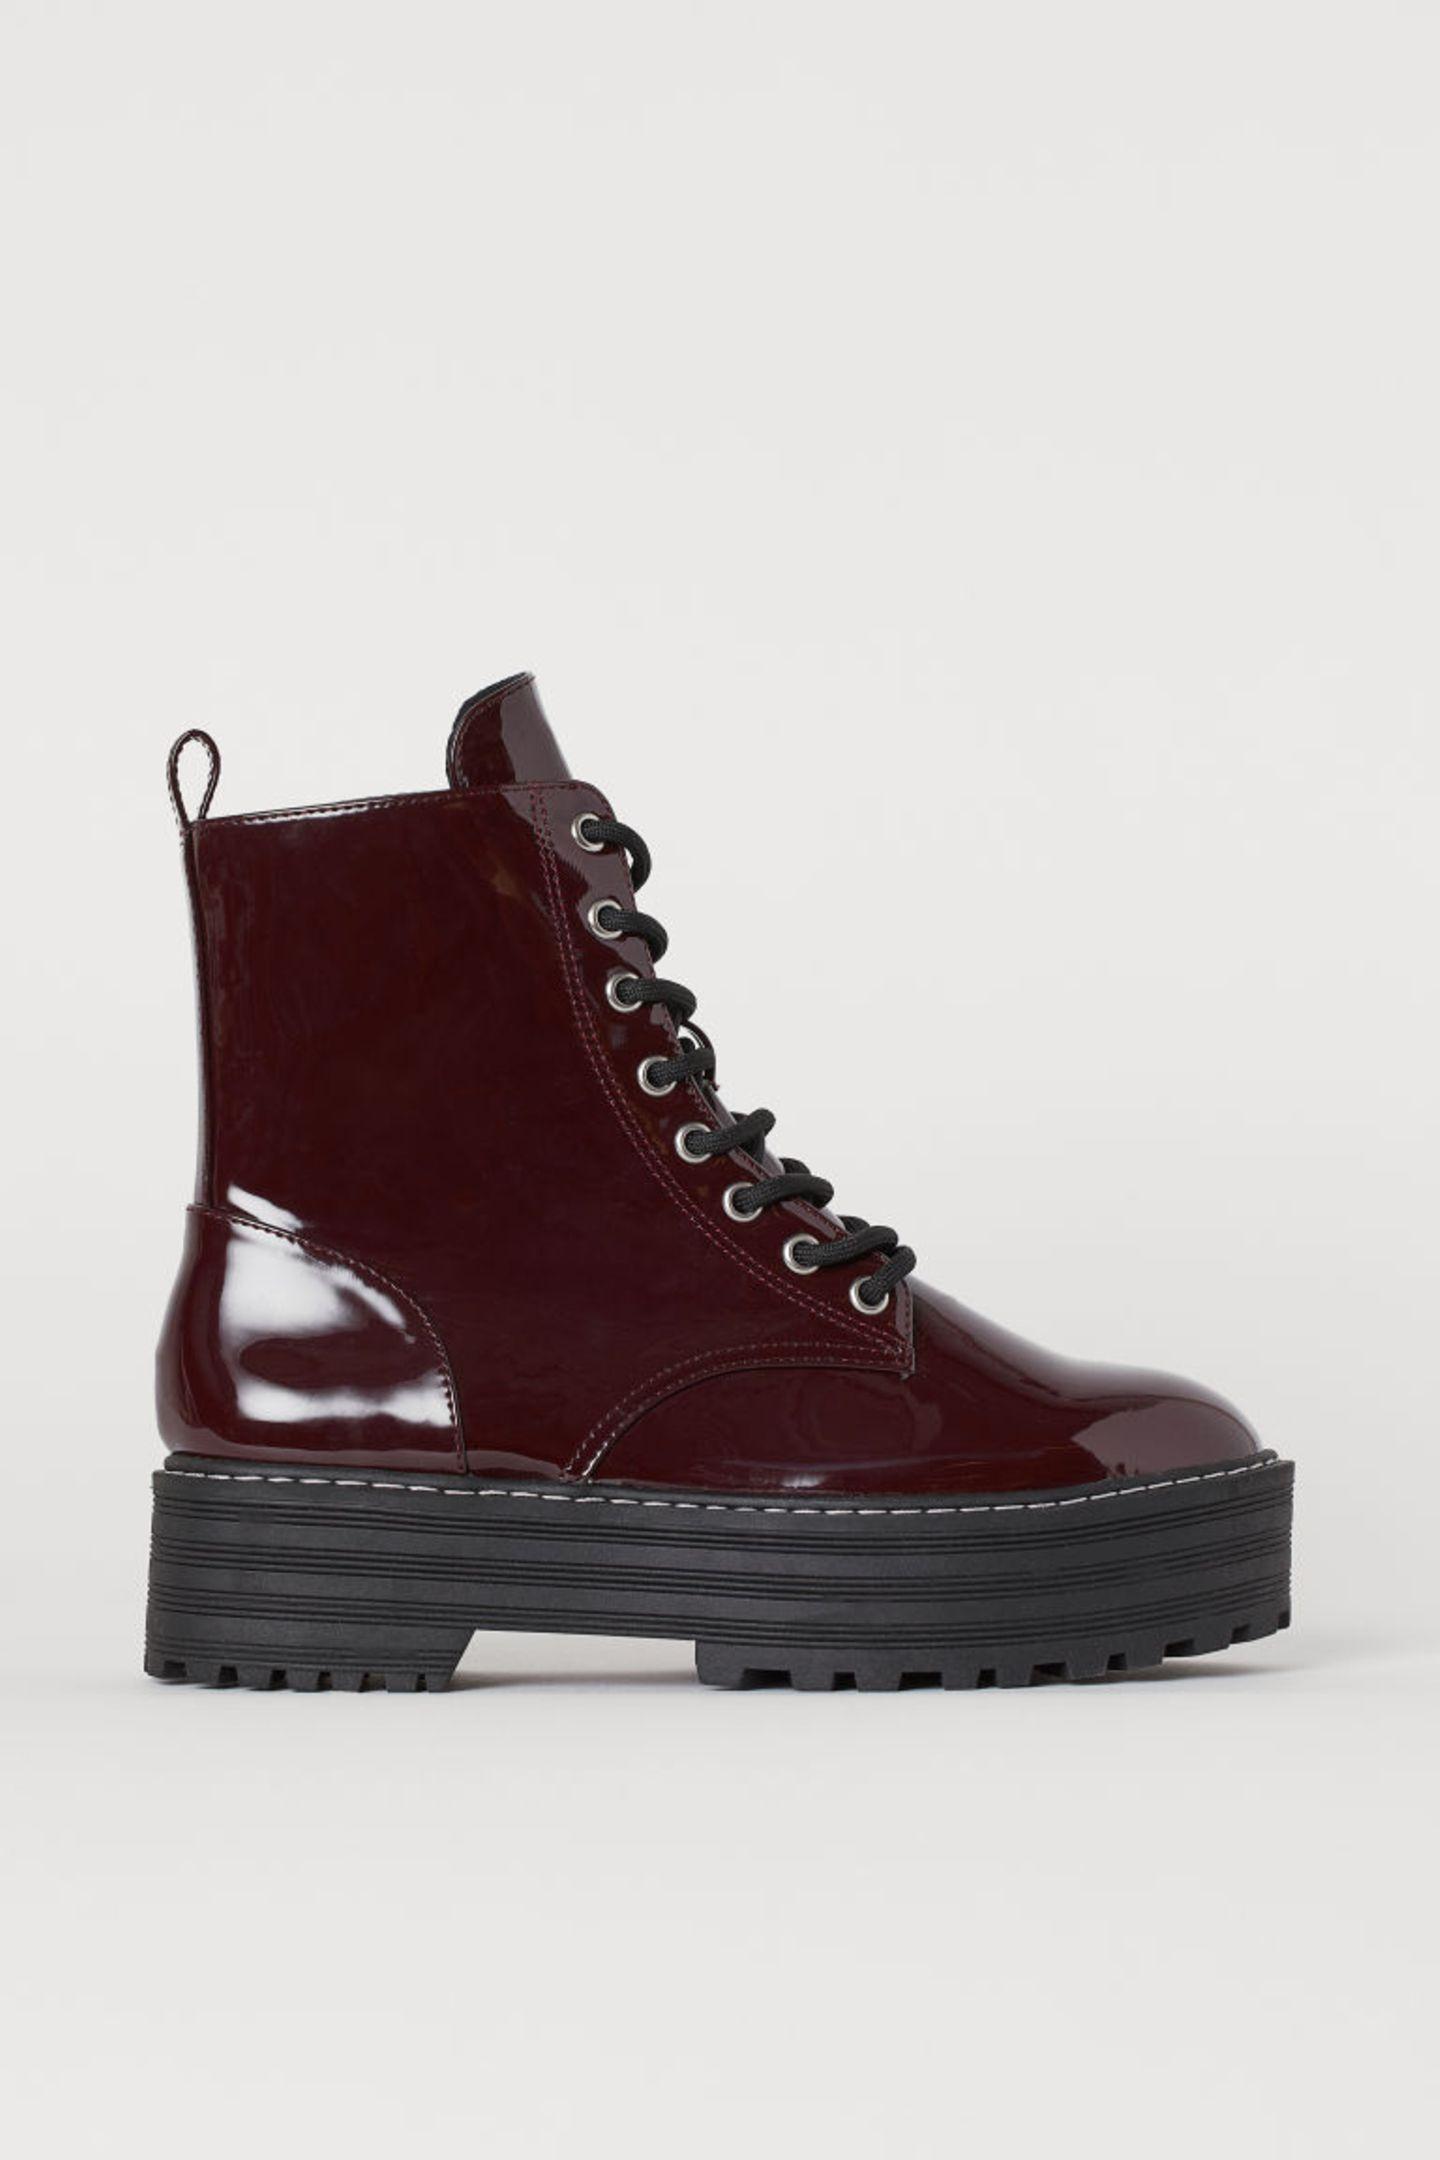 1 Style, 2 Looks: Lackboots